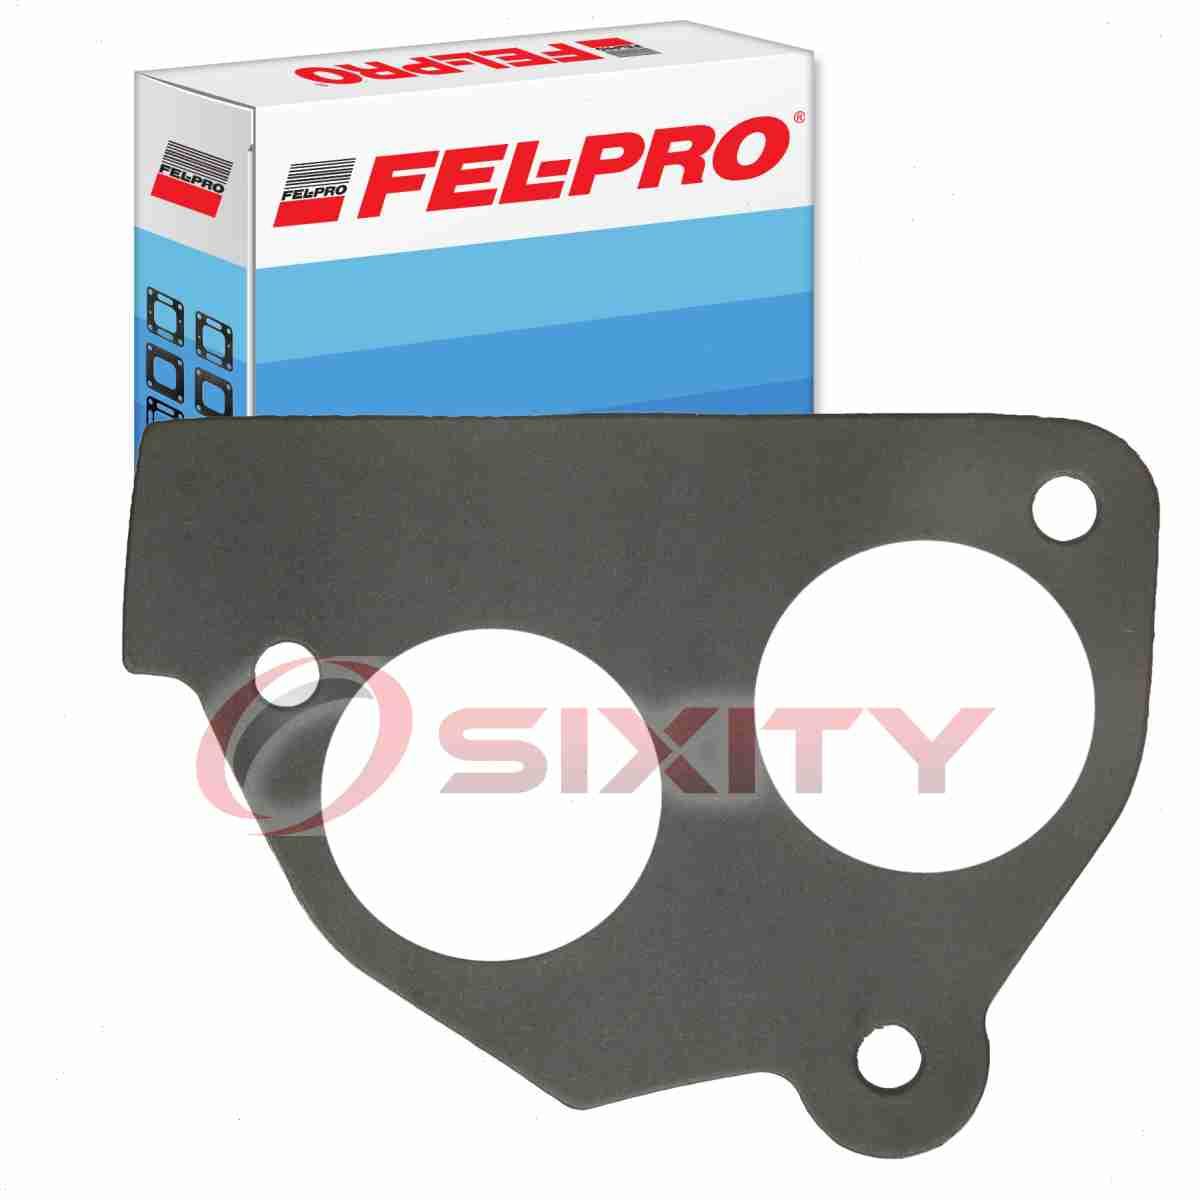 pg Fel-Pro Throttle Body Mounting Gasket for 2003-2006 Kia Sorento FelPro